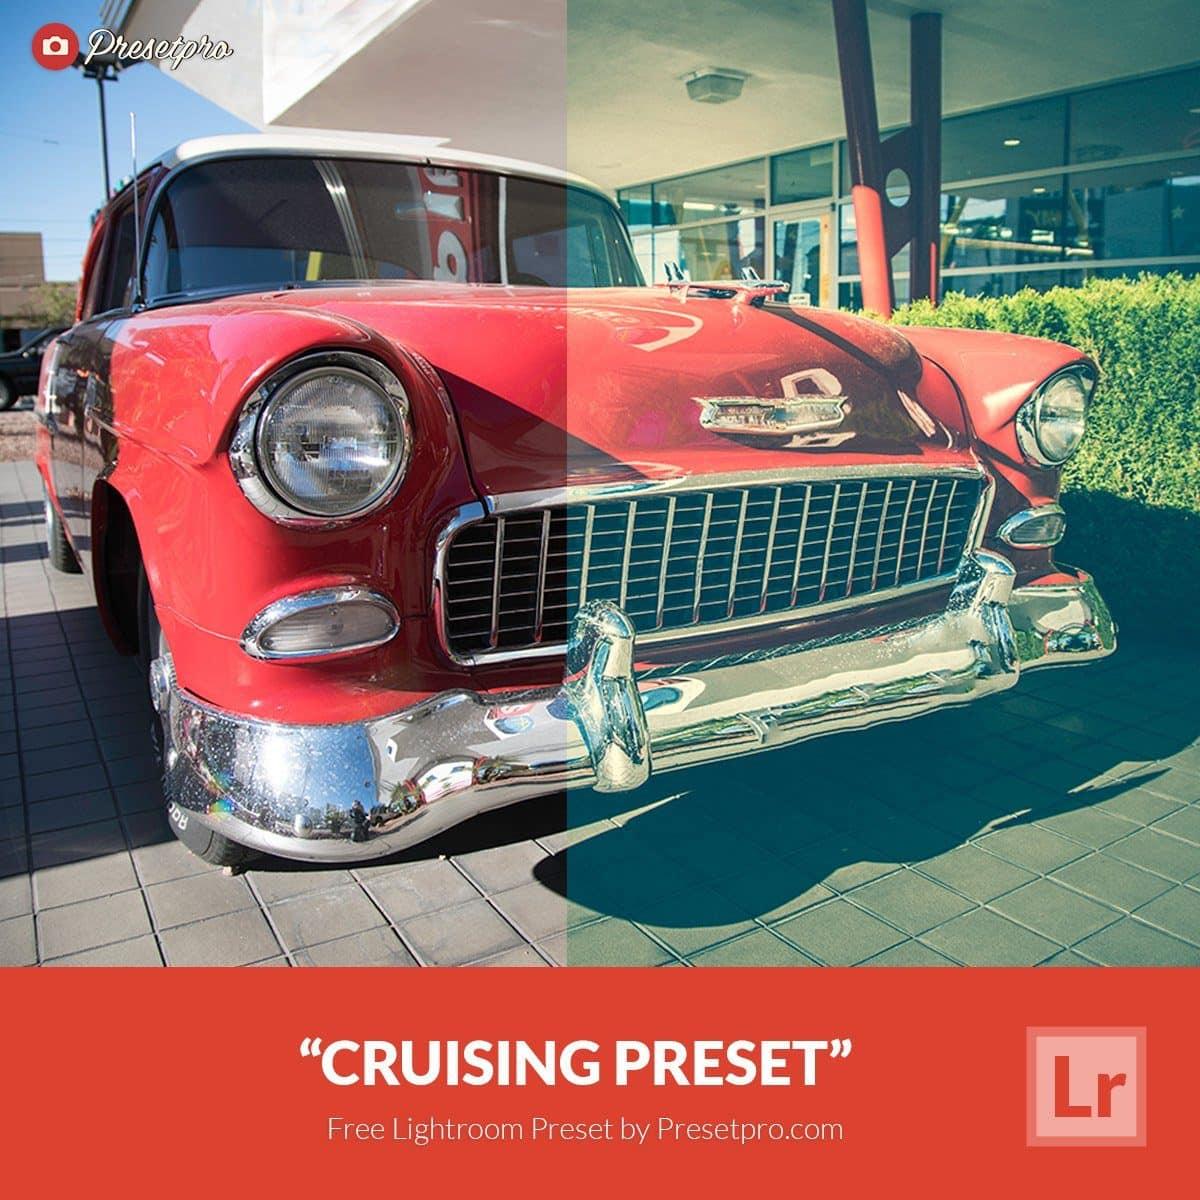 Free-Lightroom-Preset-Cruising